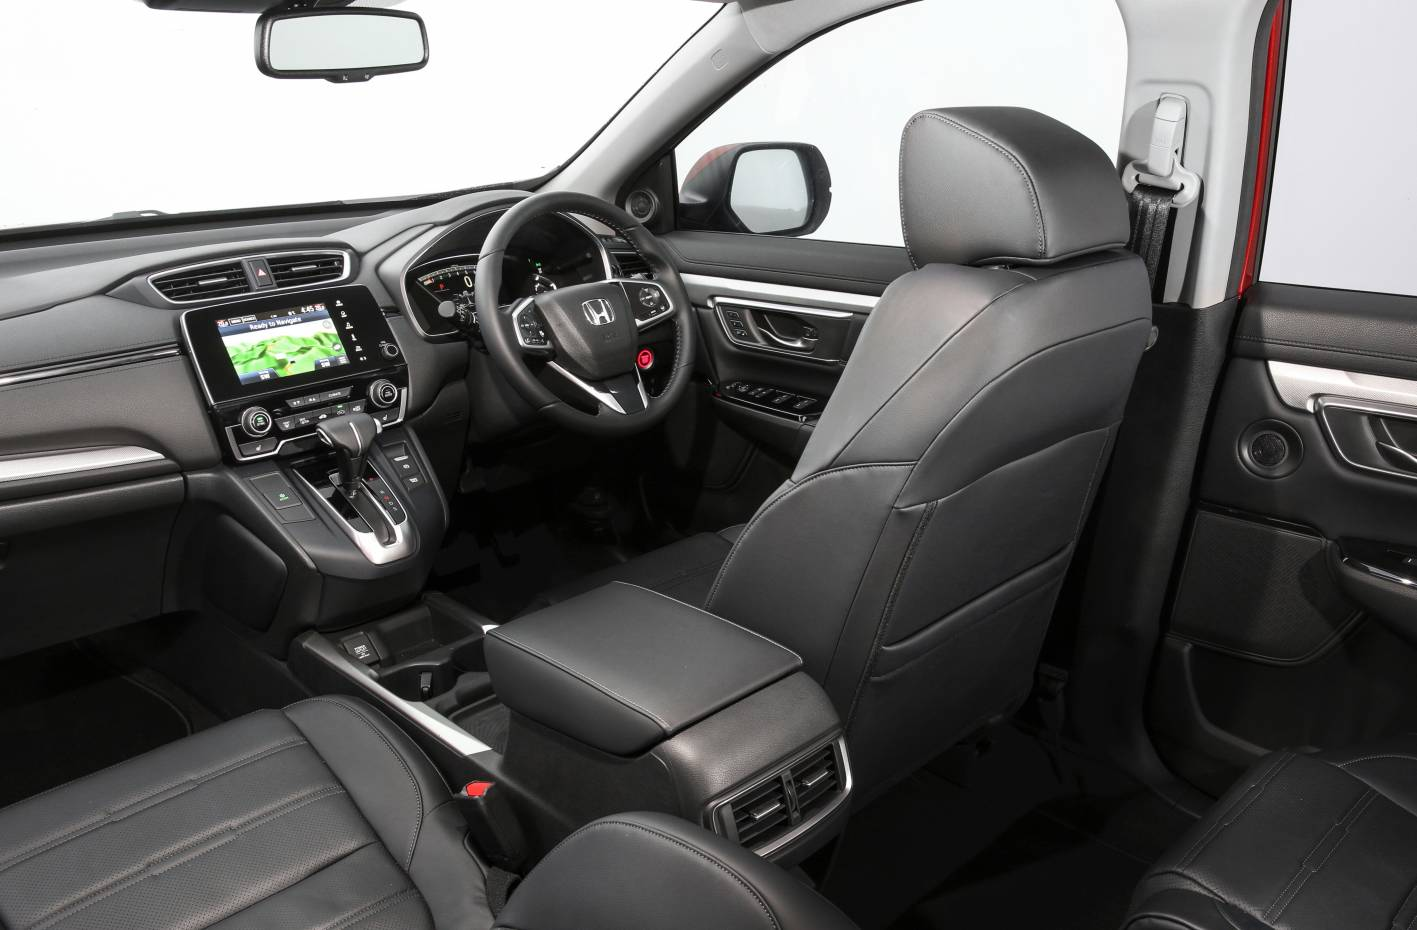 2017 honda crv lx interior best new cars for 2018. Black Bedroom Furniture Sets. Home Design Ideas